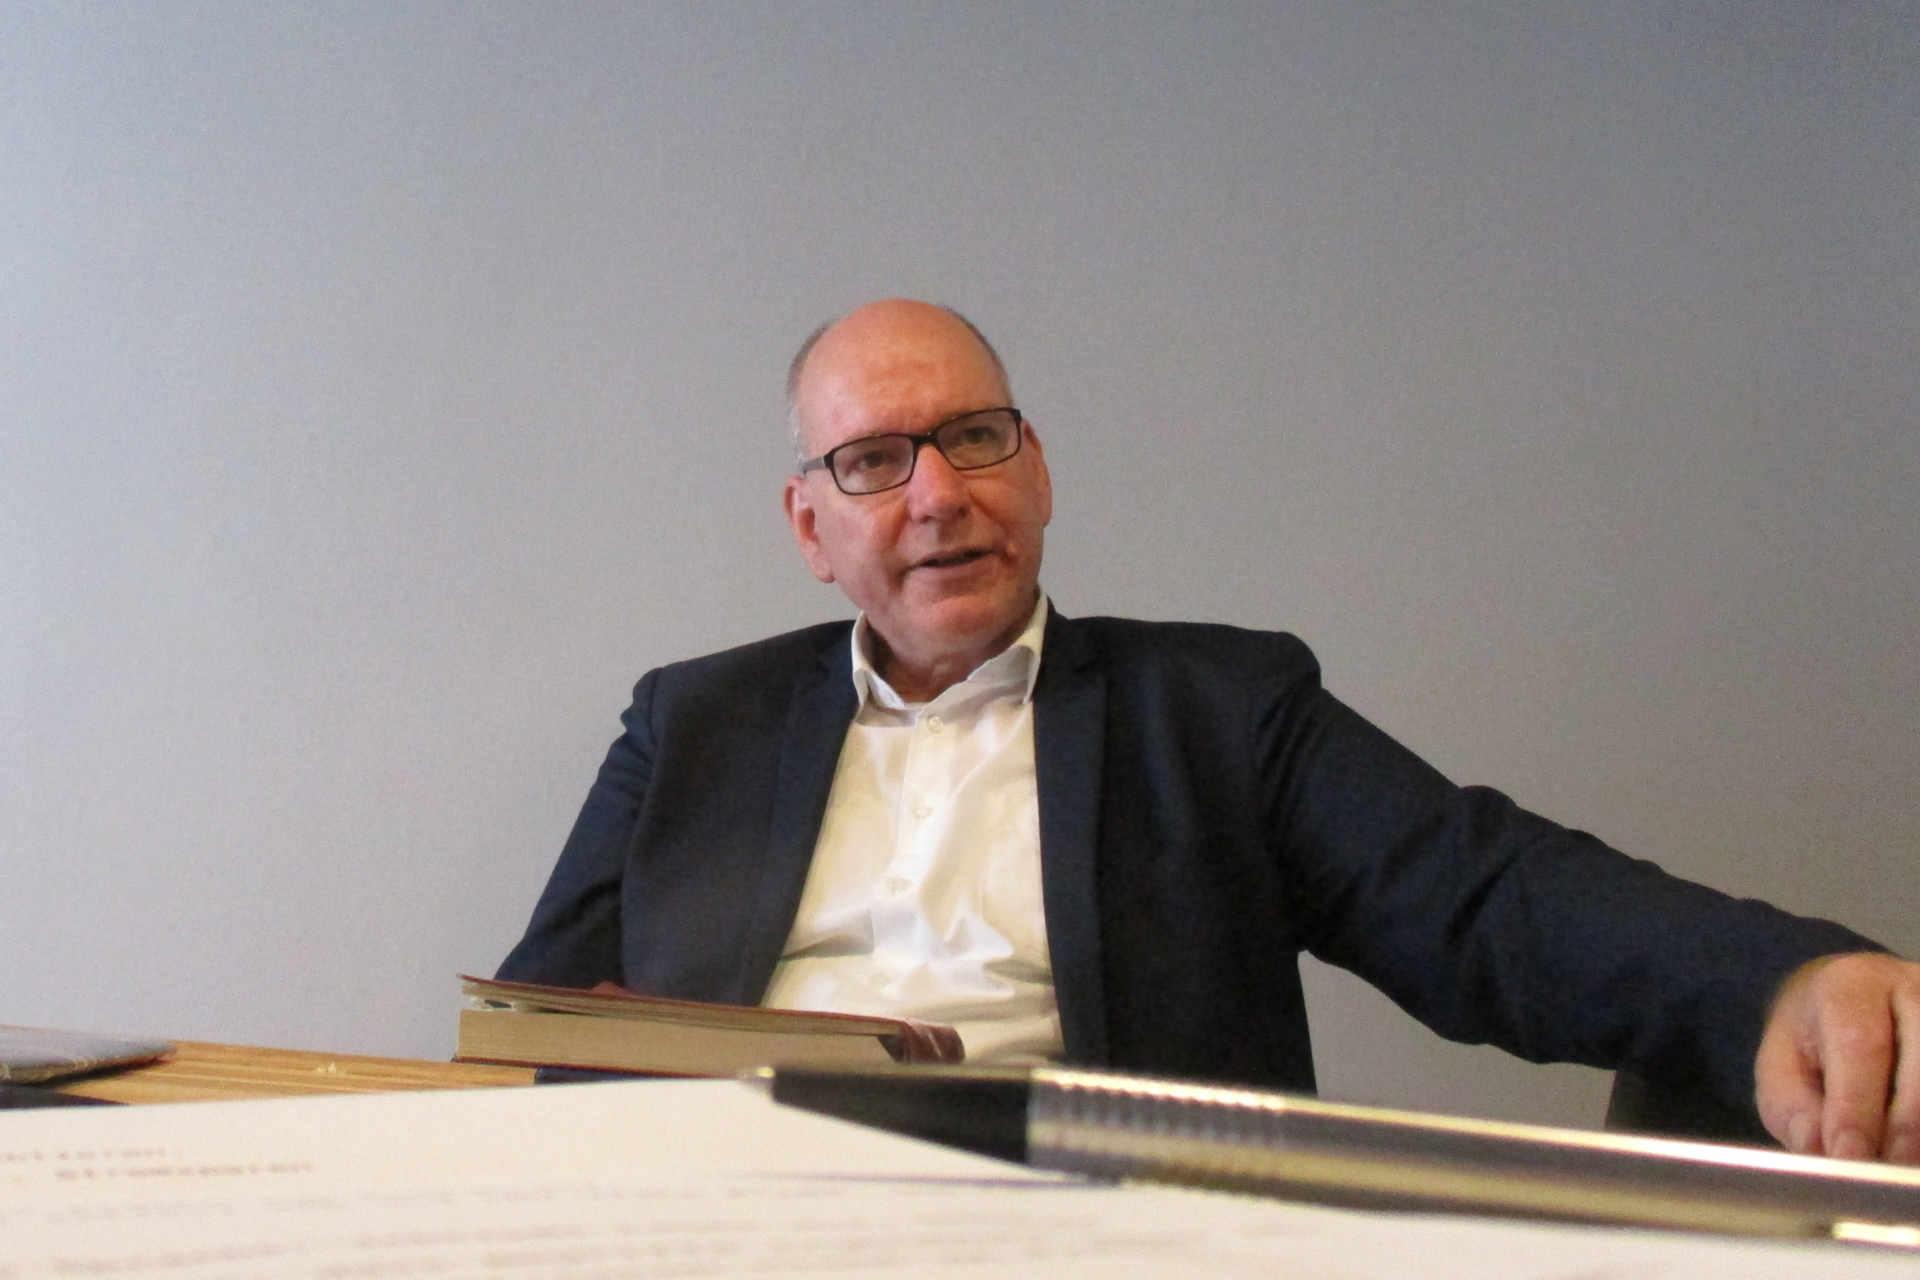 Frank Kettner-Nikolaus